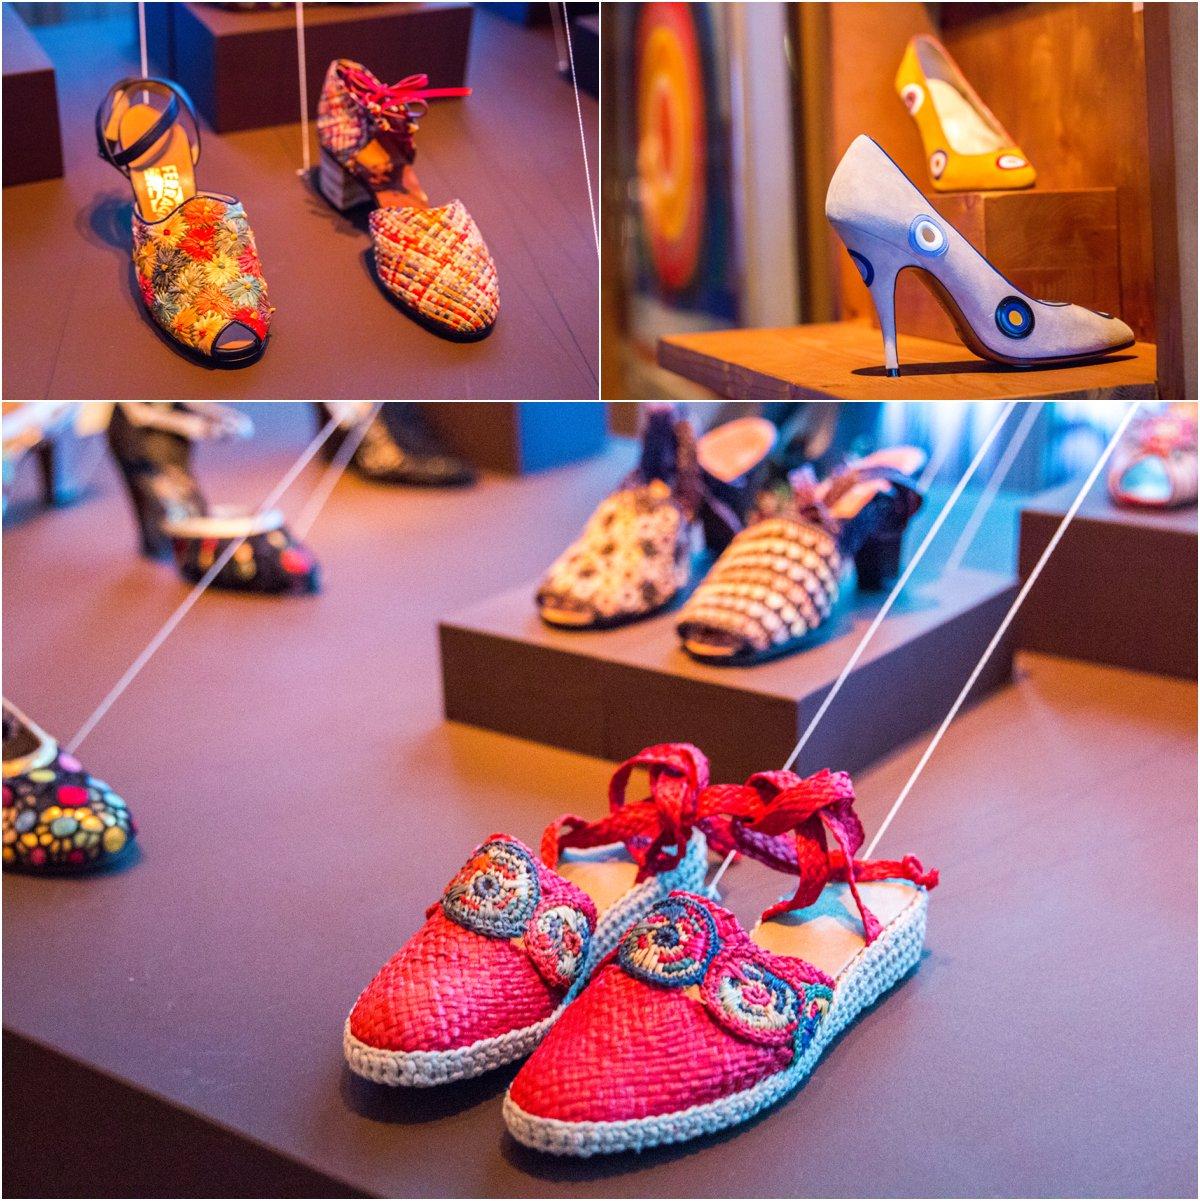 history of Ferragamo shoes, espadrilles, Salvatore Ferragamo museum in Florence Italy